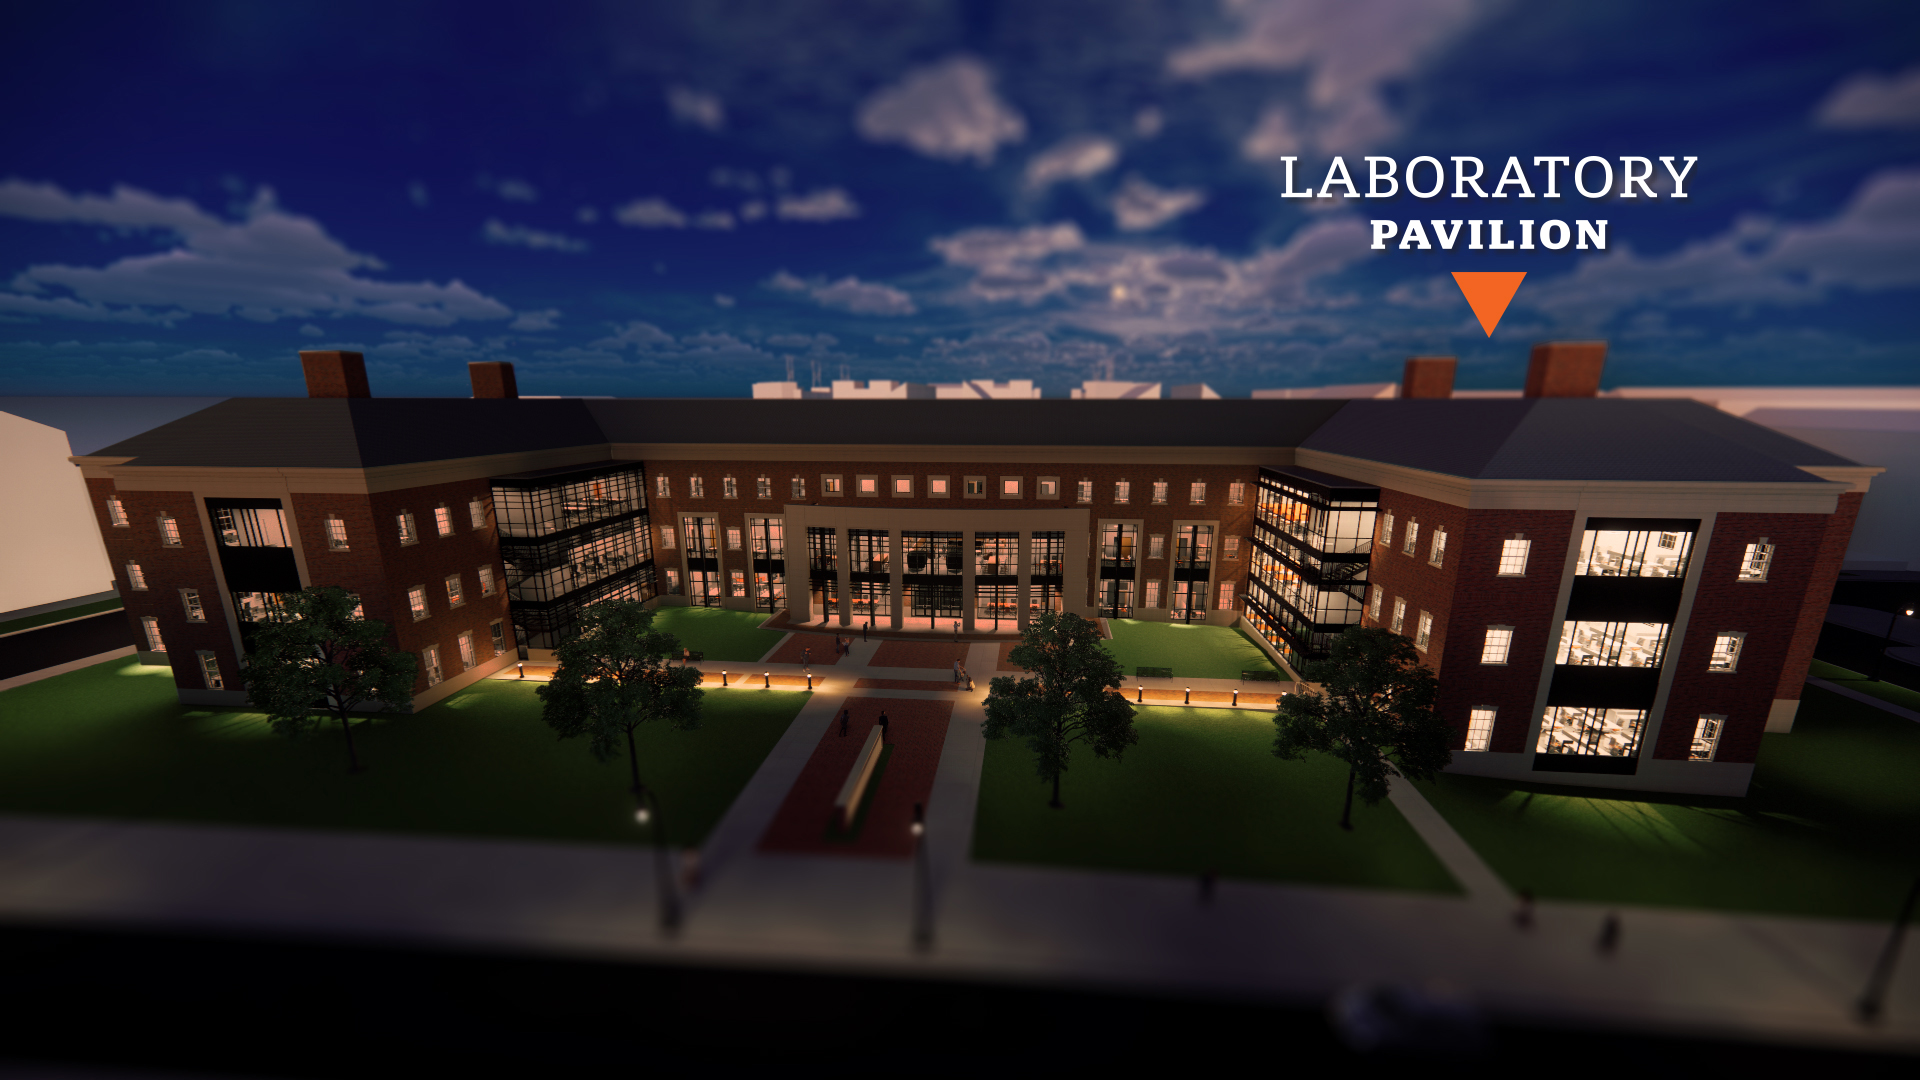 Laboratory Pavilion